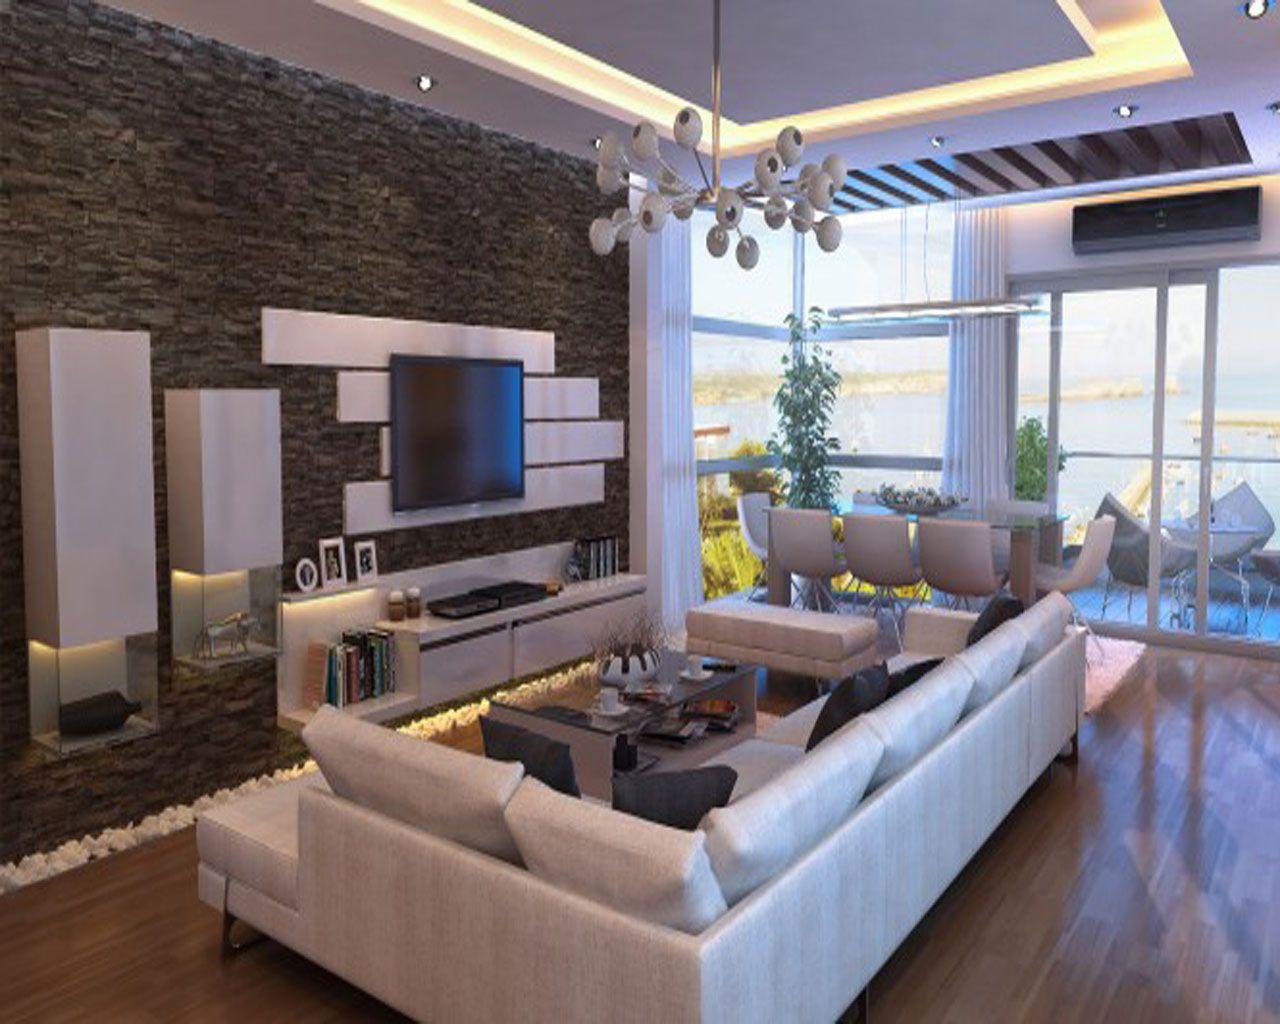 2013 Mobile Home Interiors Room Decor Ideas 2013 Thread